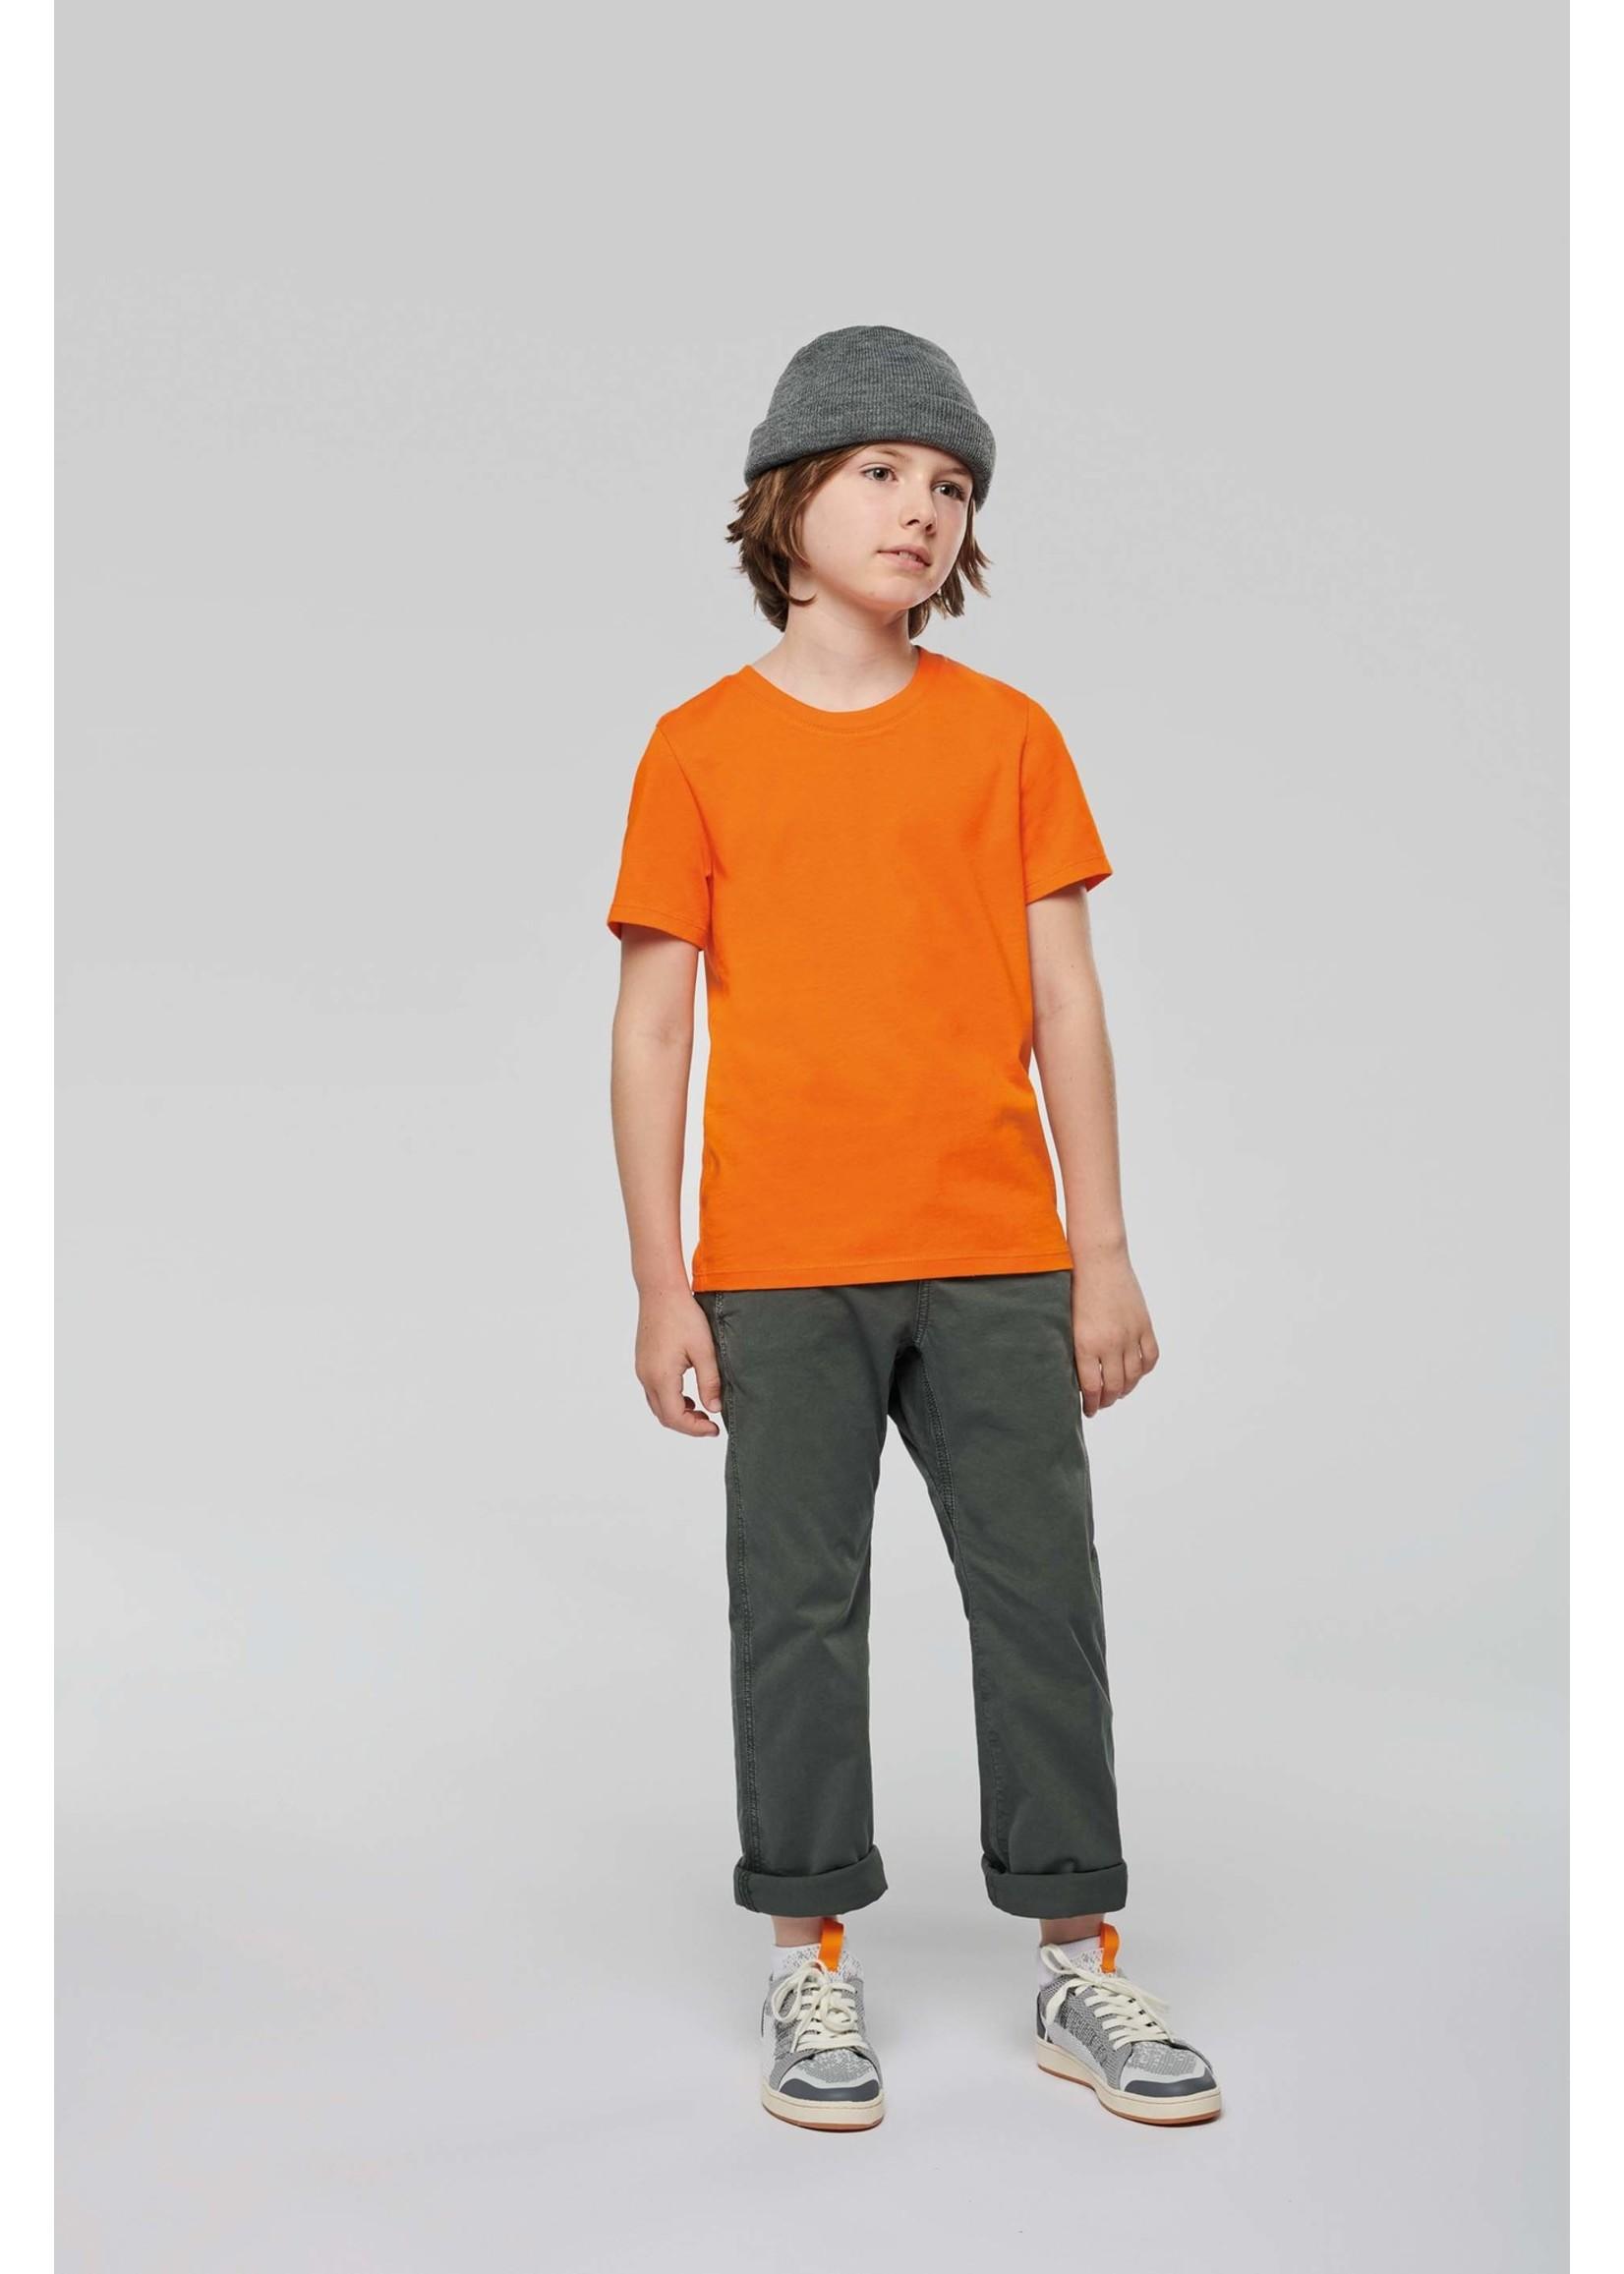 Eco-Friendly KIDS T-shirt - Navy